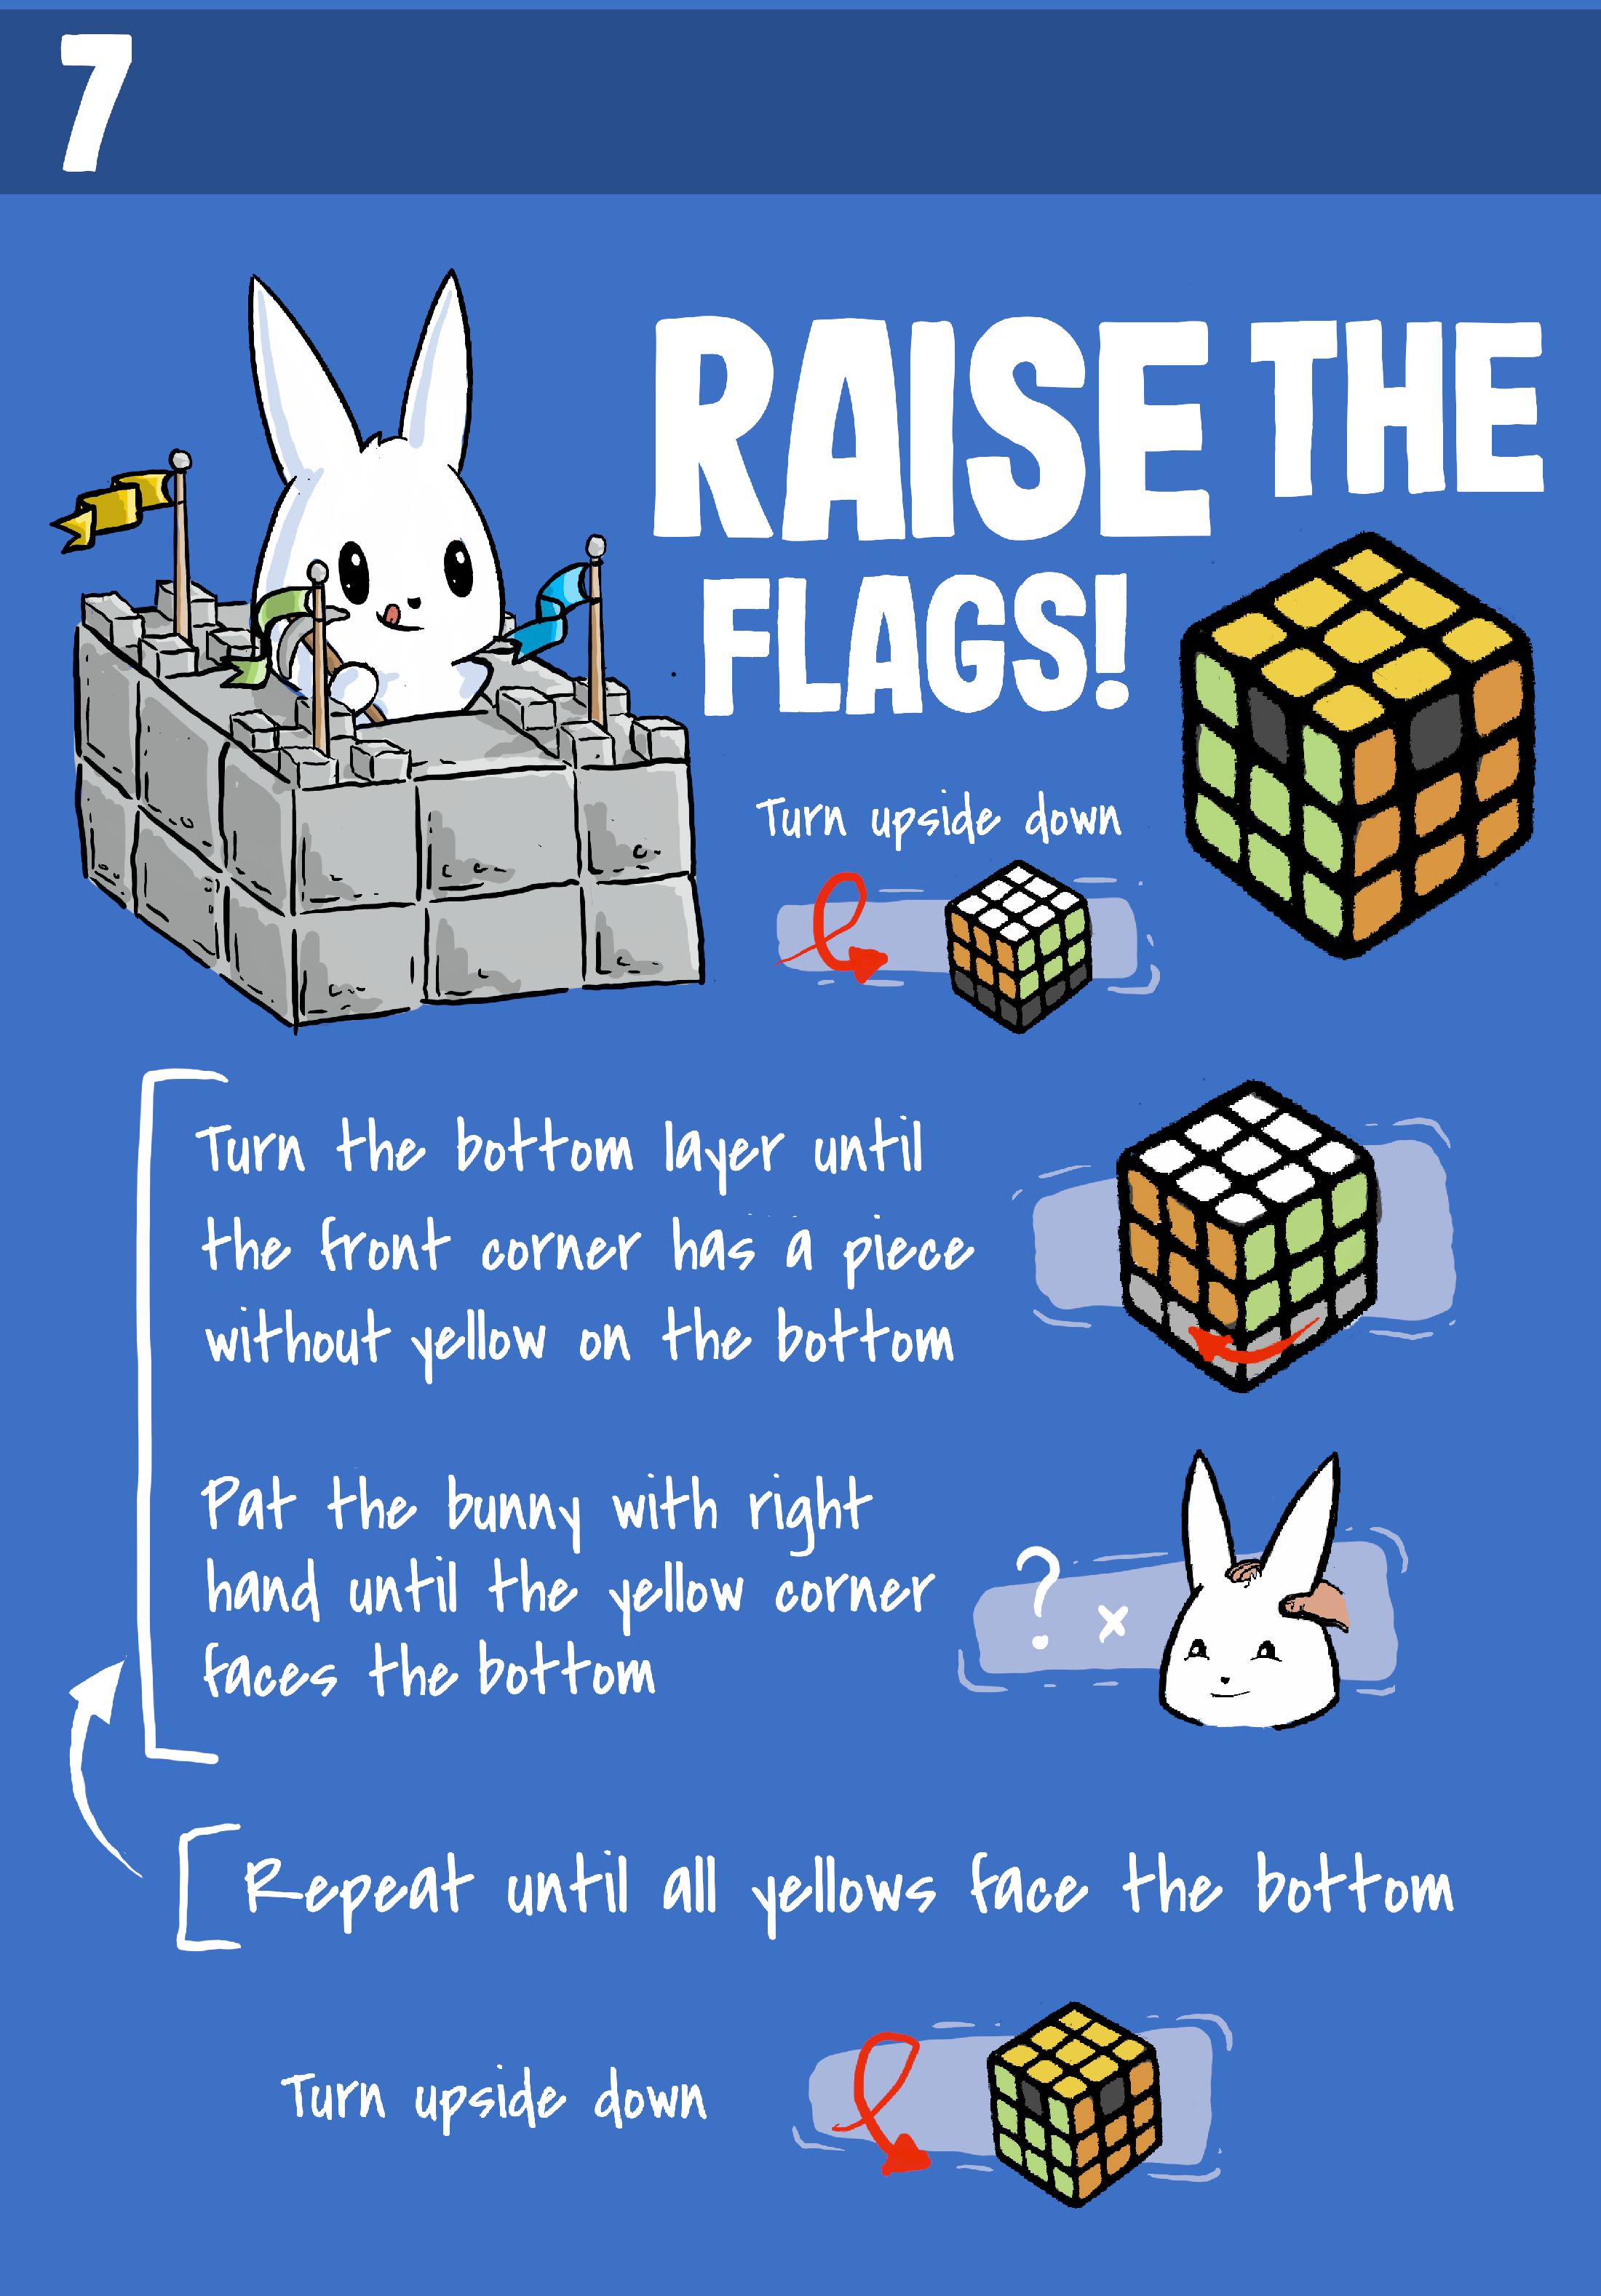 Raise The Flags